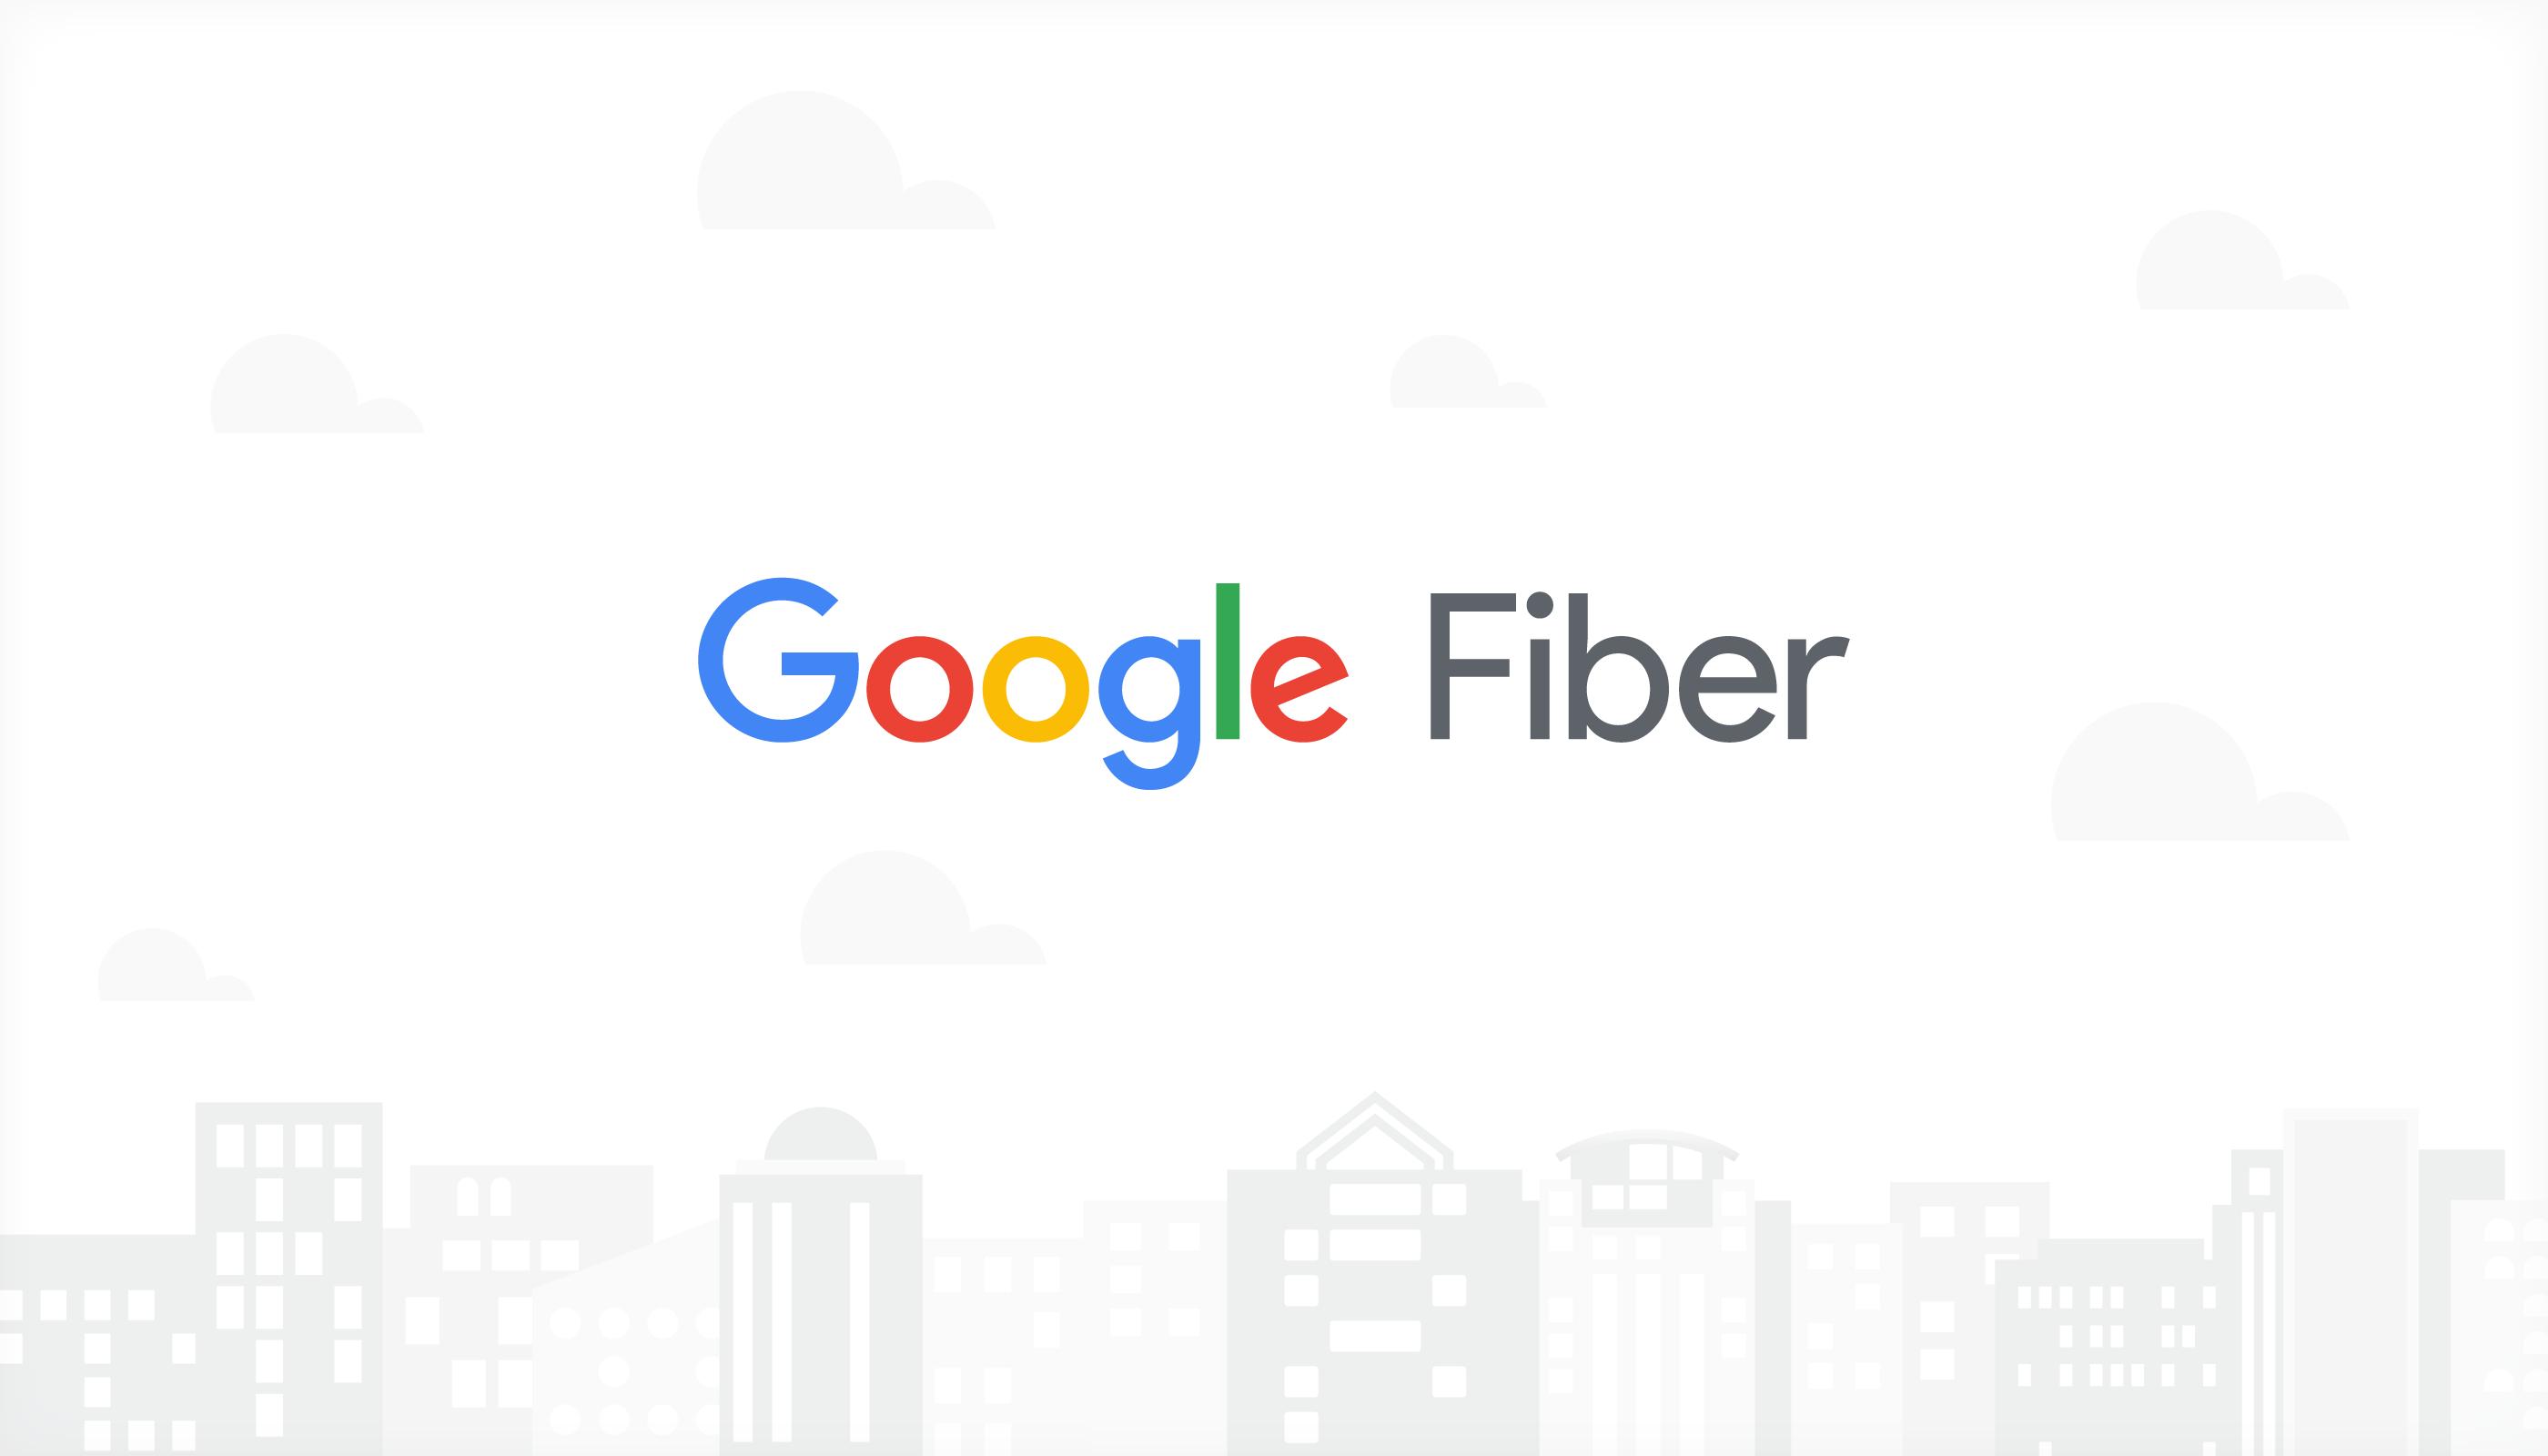 GoogleFiber_Guidelines_Illo_02